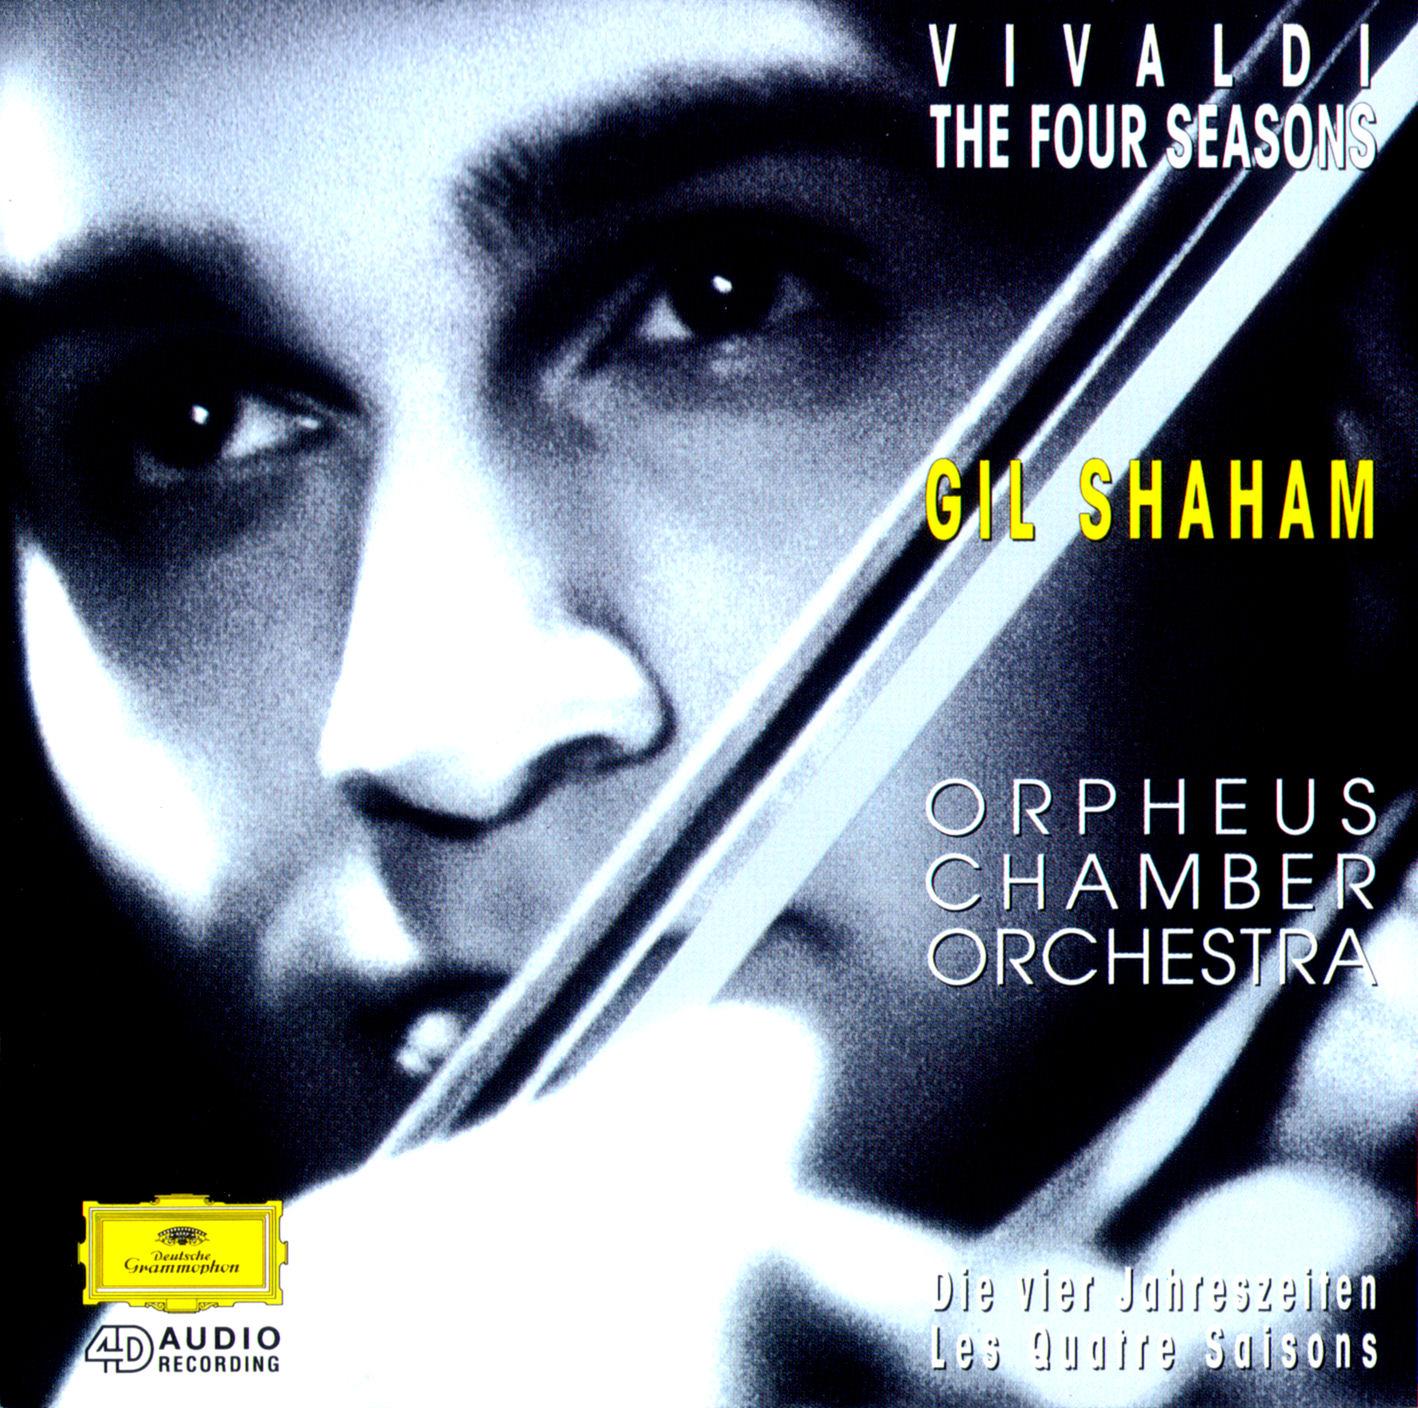 Vivaldi The Four Seasons Orpheus Chamber Orch Shaham